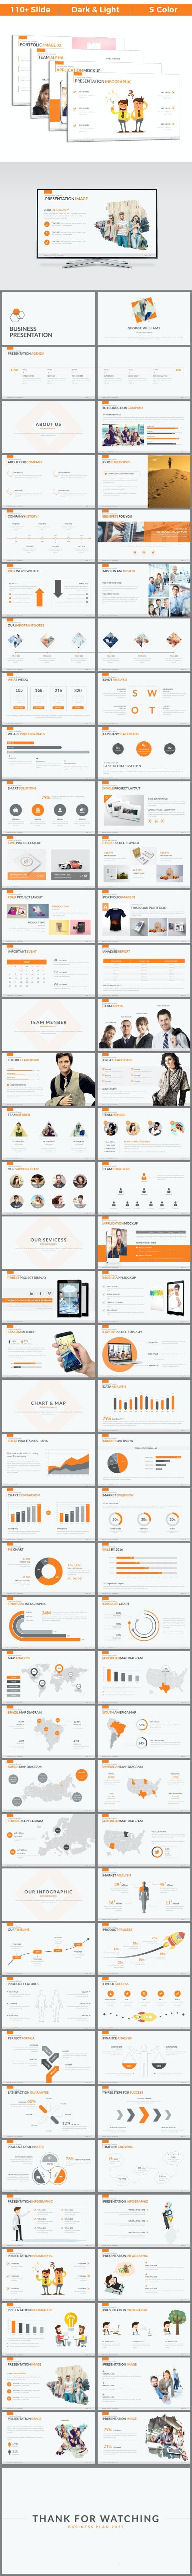 Business Plan 2017 Presentation Templates - PowerPoint Templates Presentation Templates